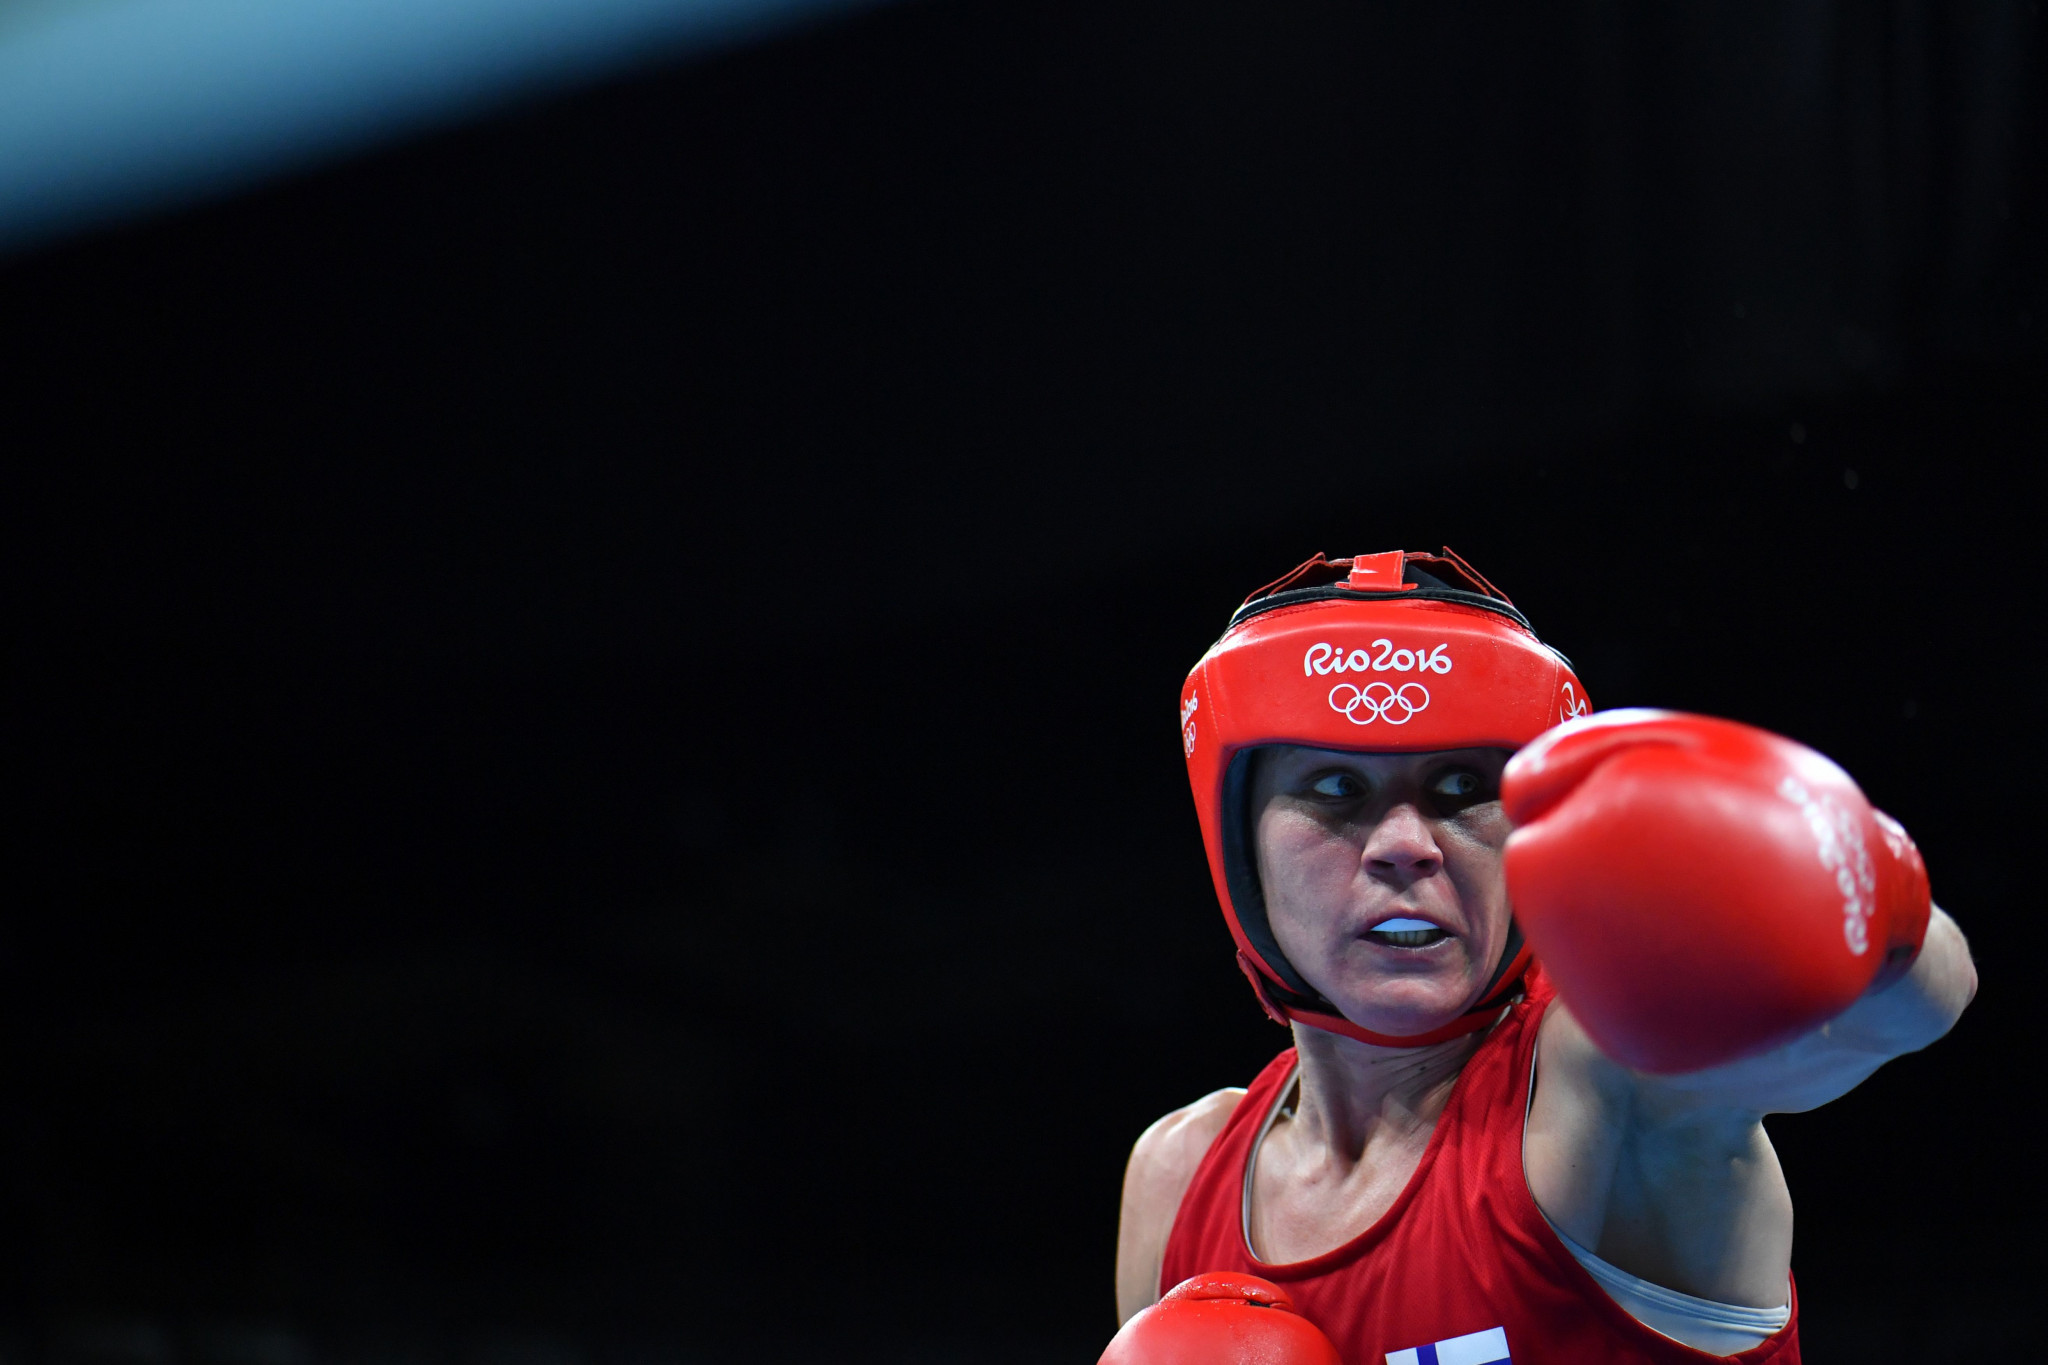 Potkonen begins with win at European Women's Boxing Championships